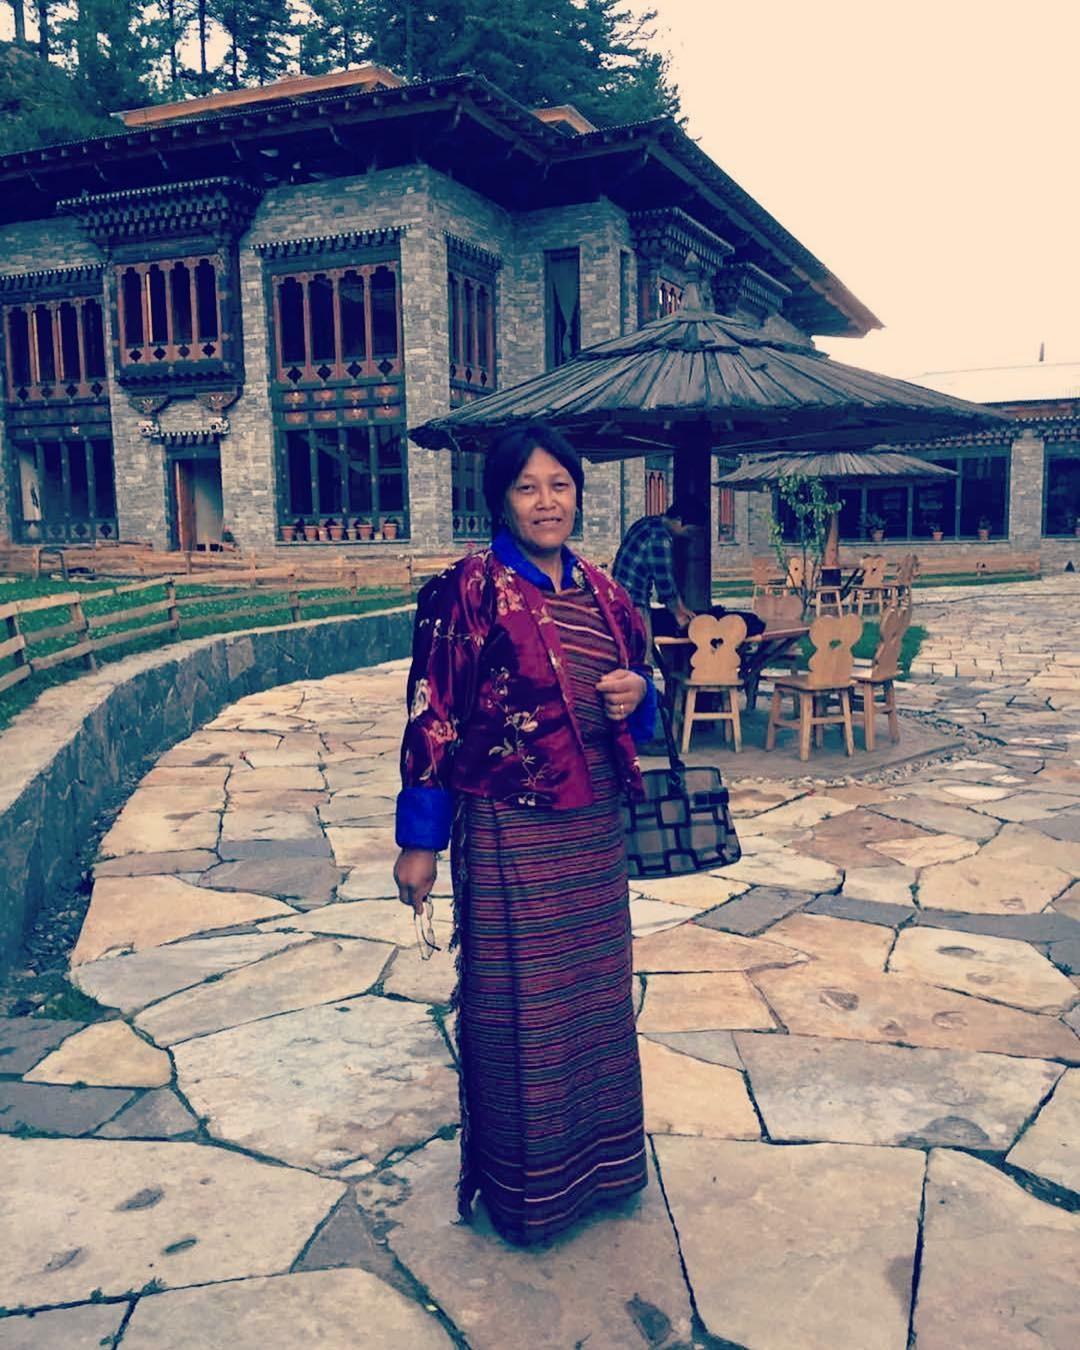 Ama, Matriarch of Bhutan Mountain Resort